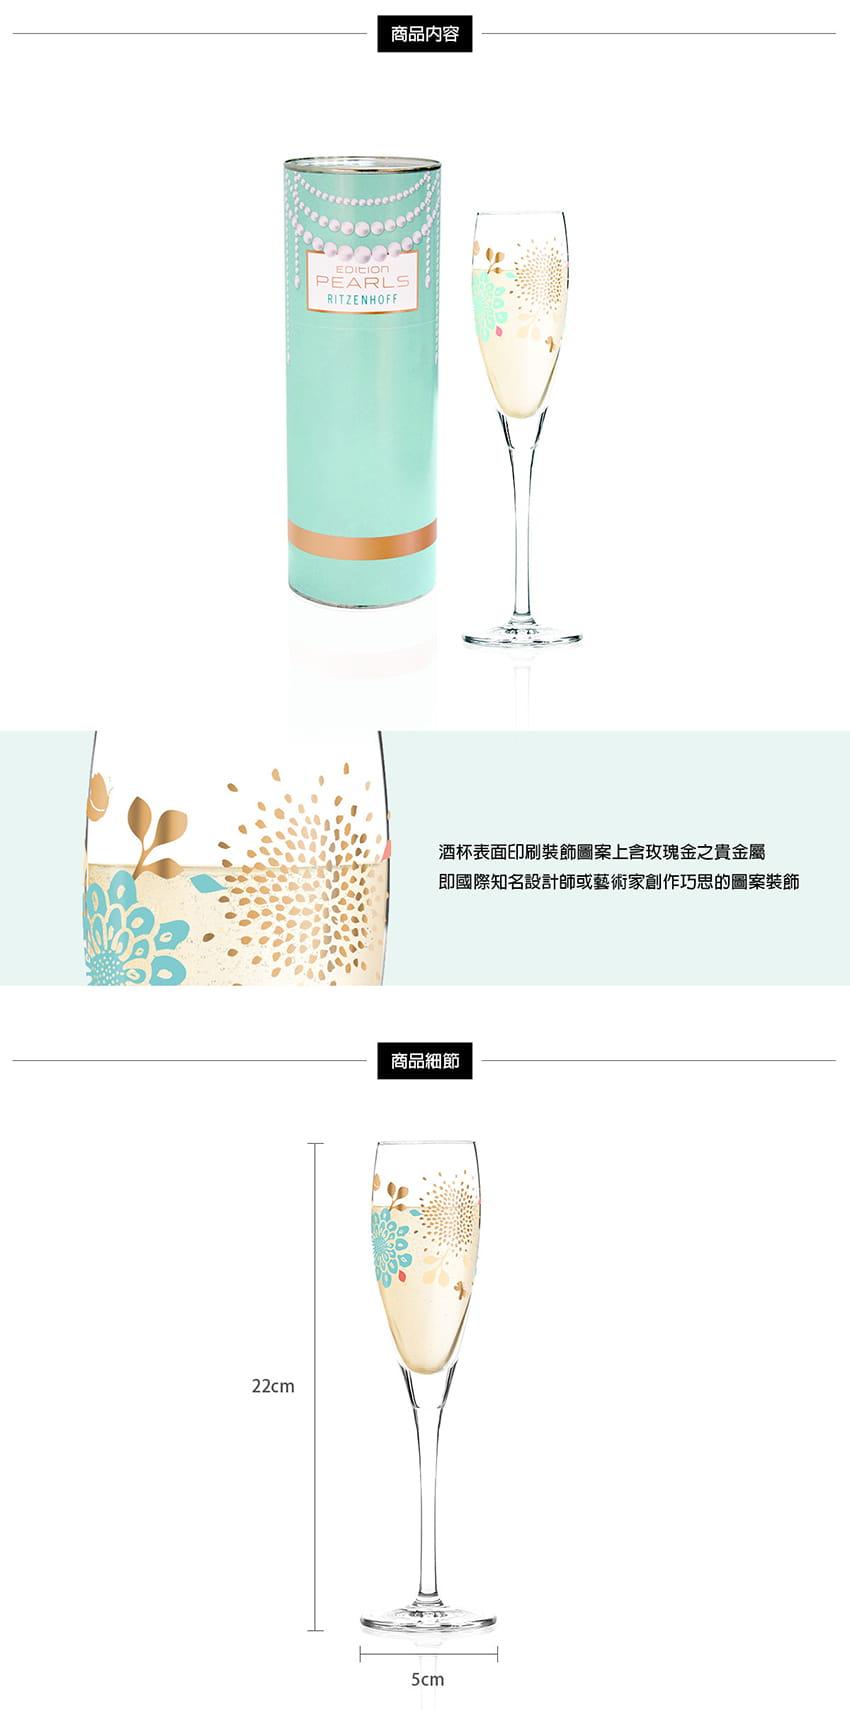 德國 RITZENHOFF PEARLS EDITION 珍珠氣泡酒杯-愛情煙火